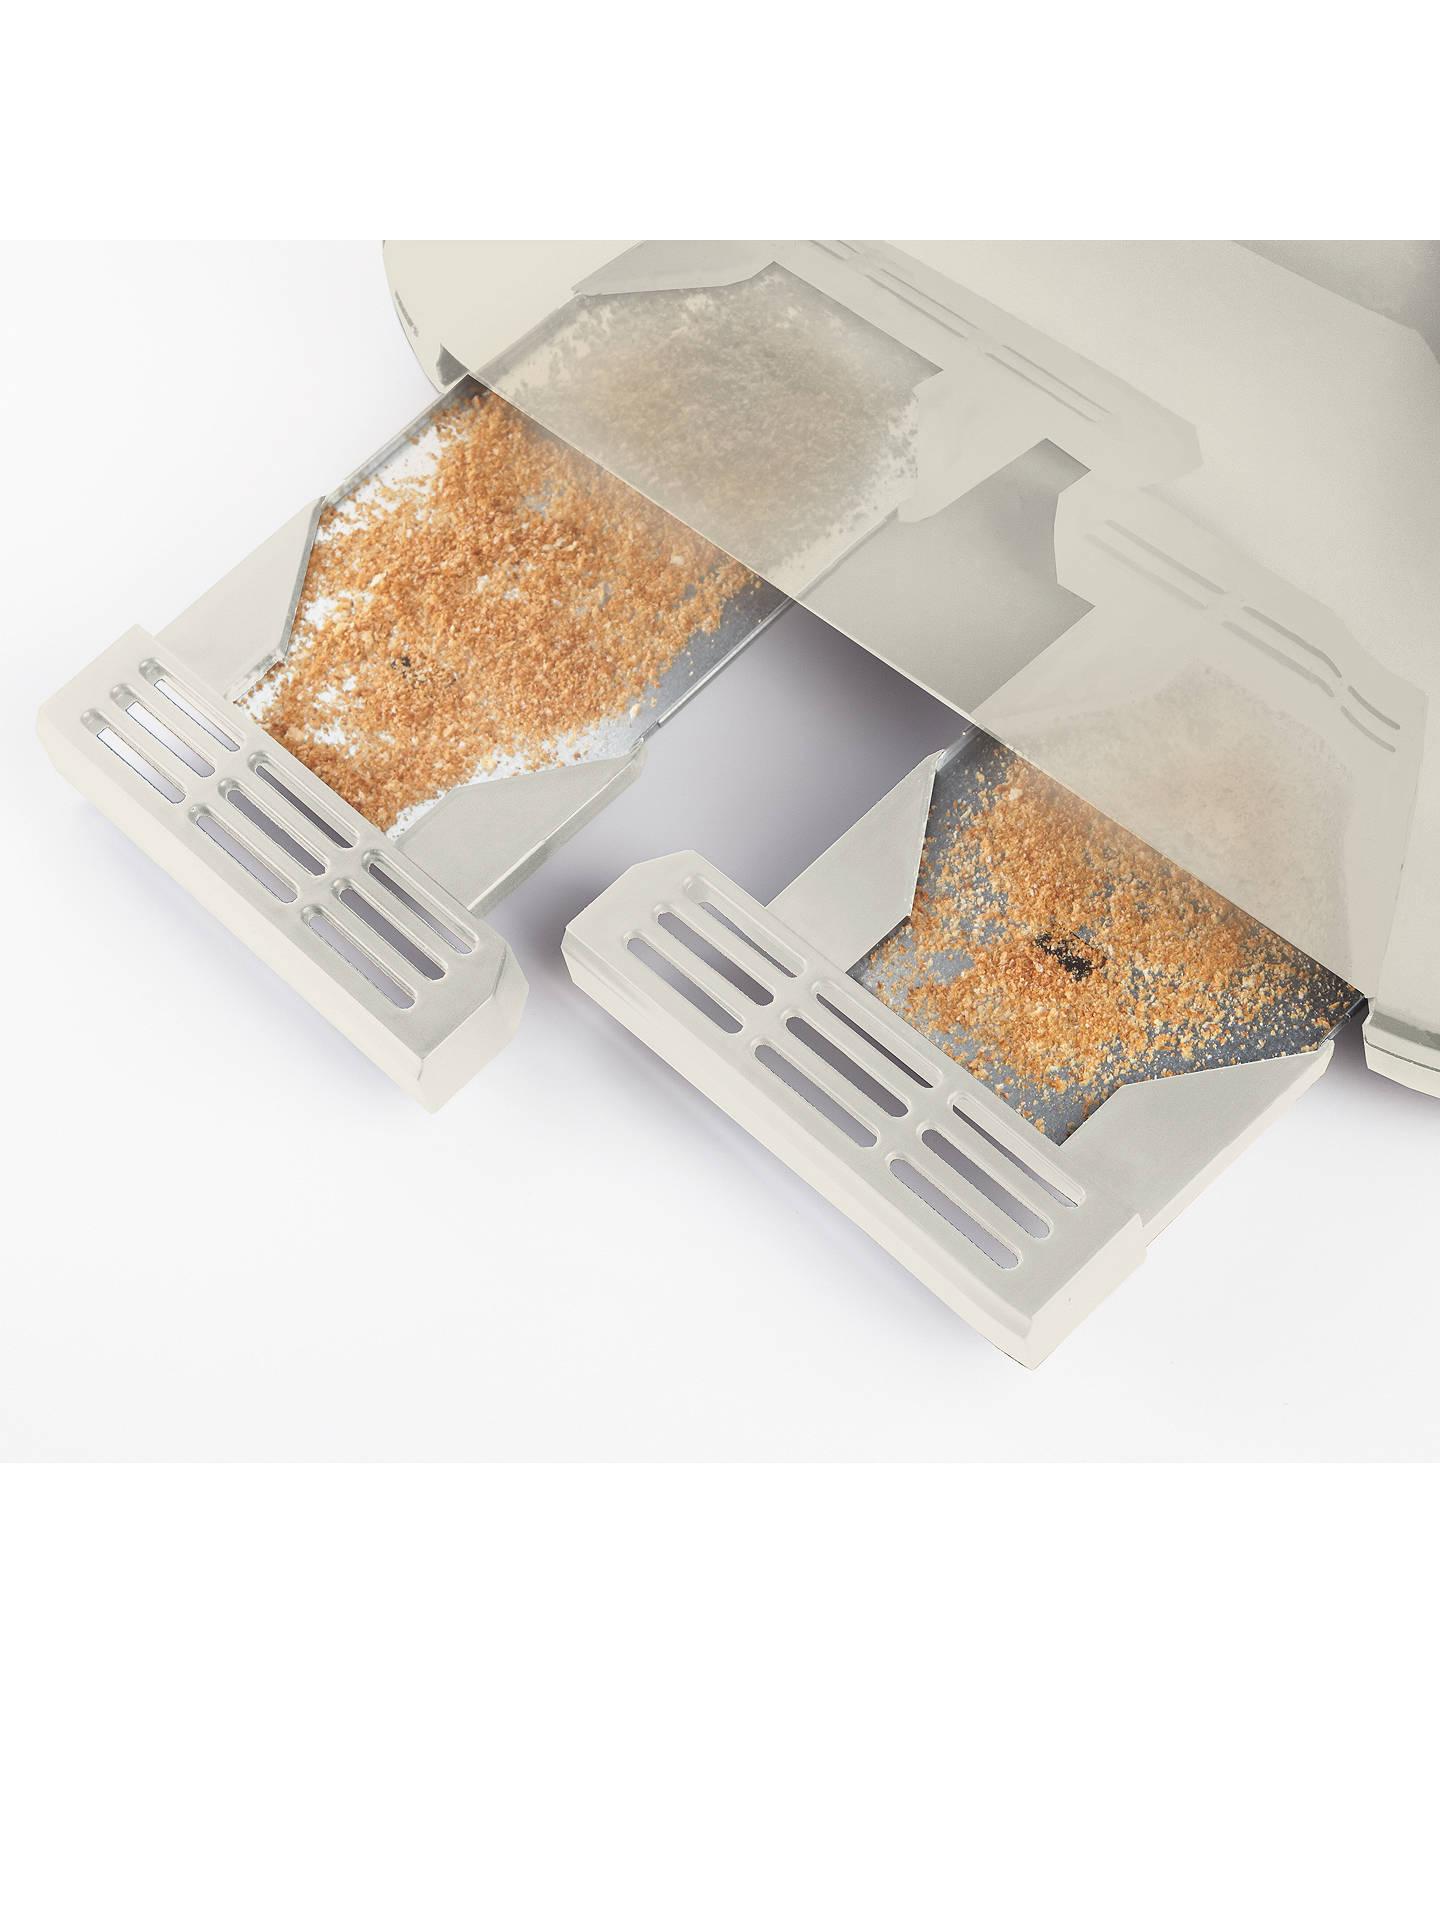 Breville Impressions 4 Slice Toaster At John Lewis Amp Partners